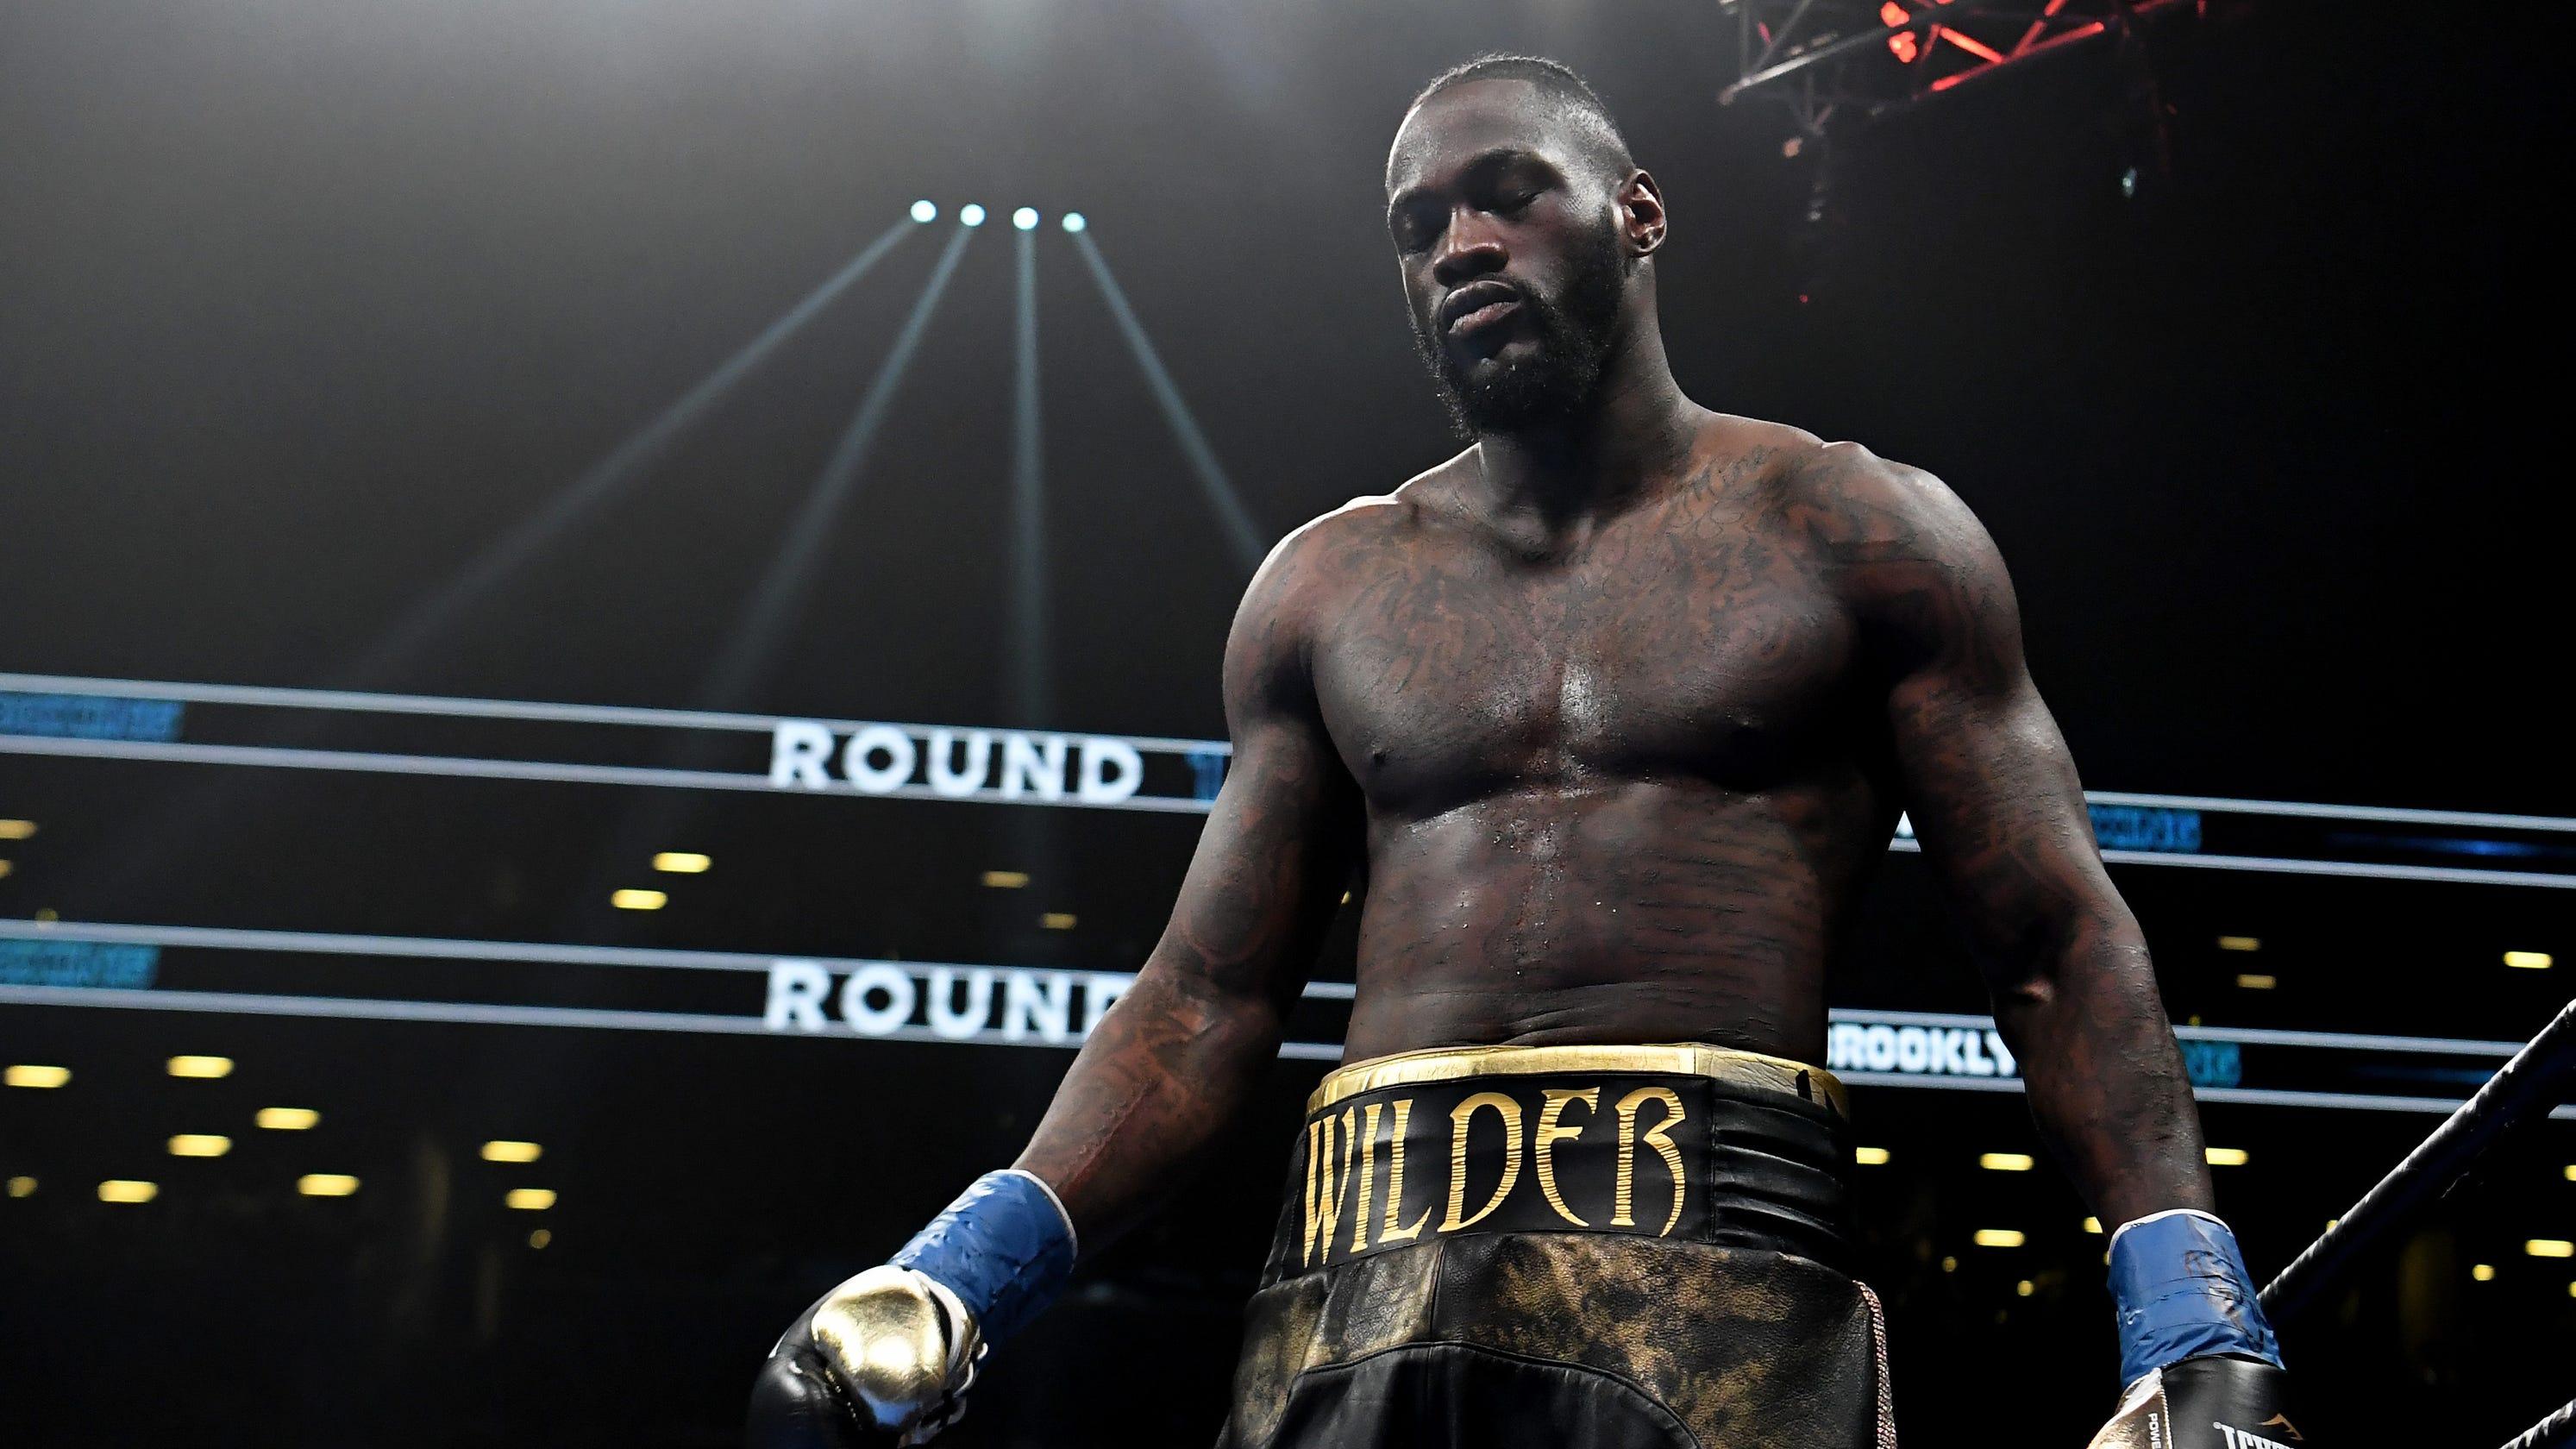 Deontay Wilder KOs Dominic Breazeale in first round to defend heavyweight belt